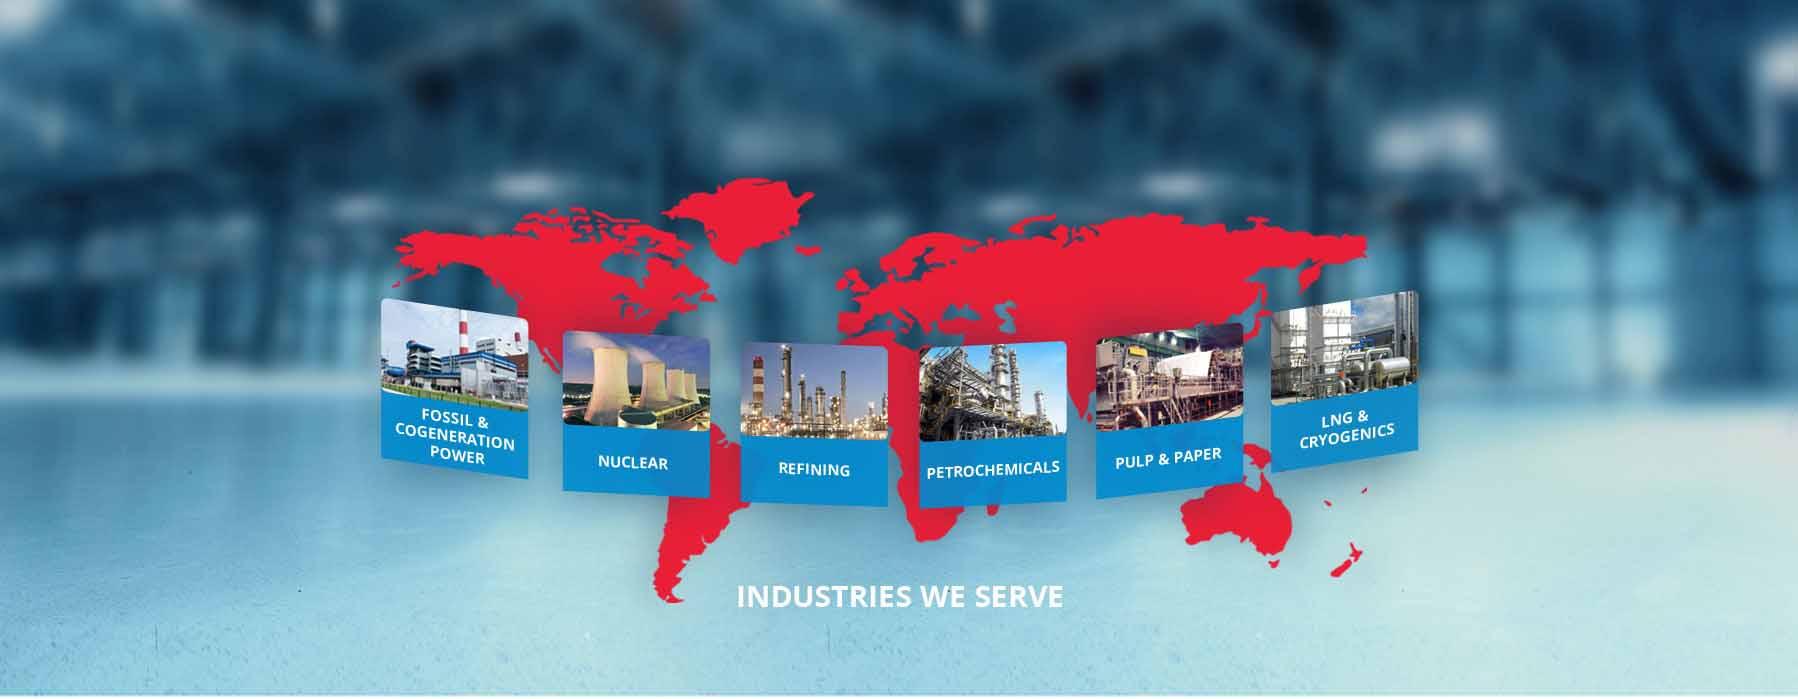 Aira Serve in Industries